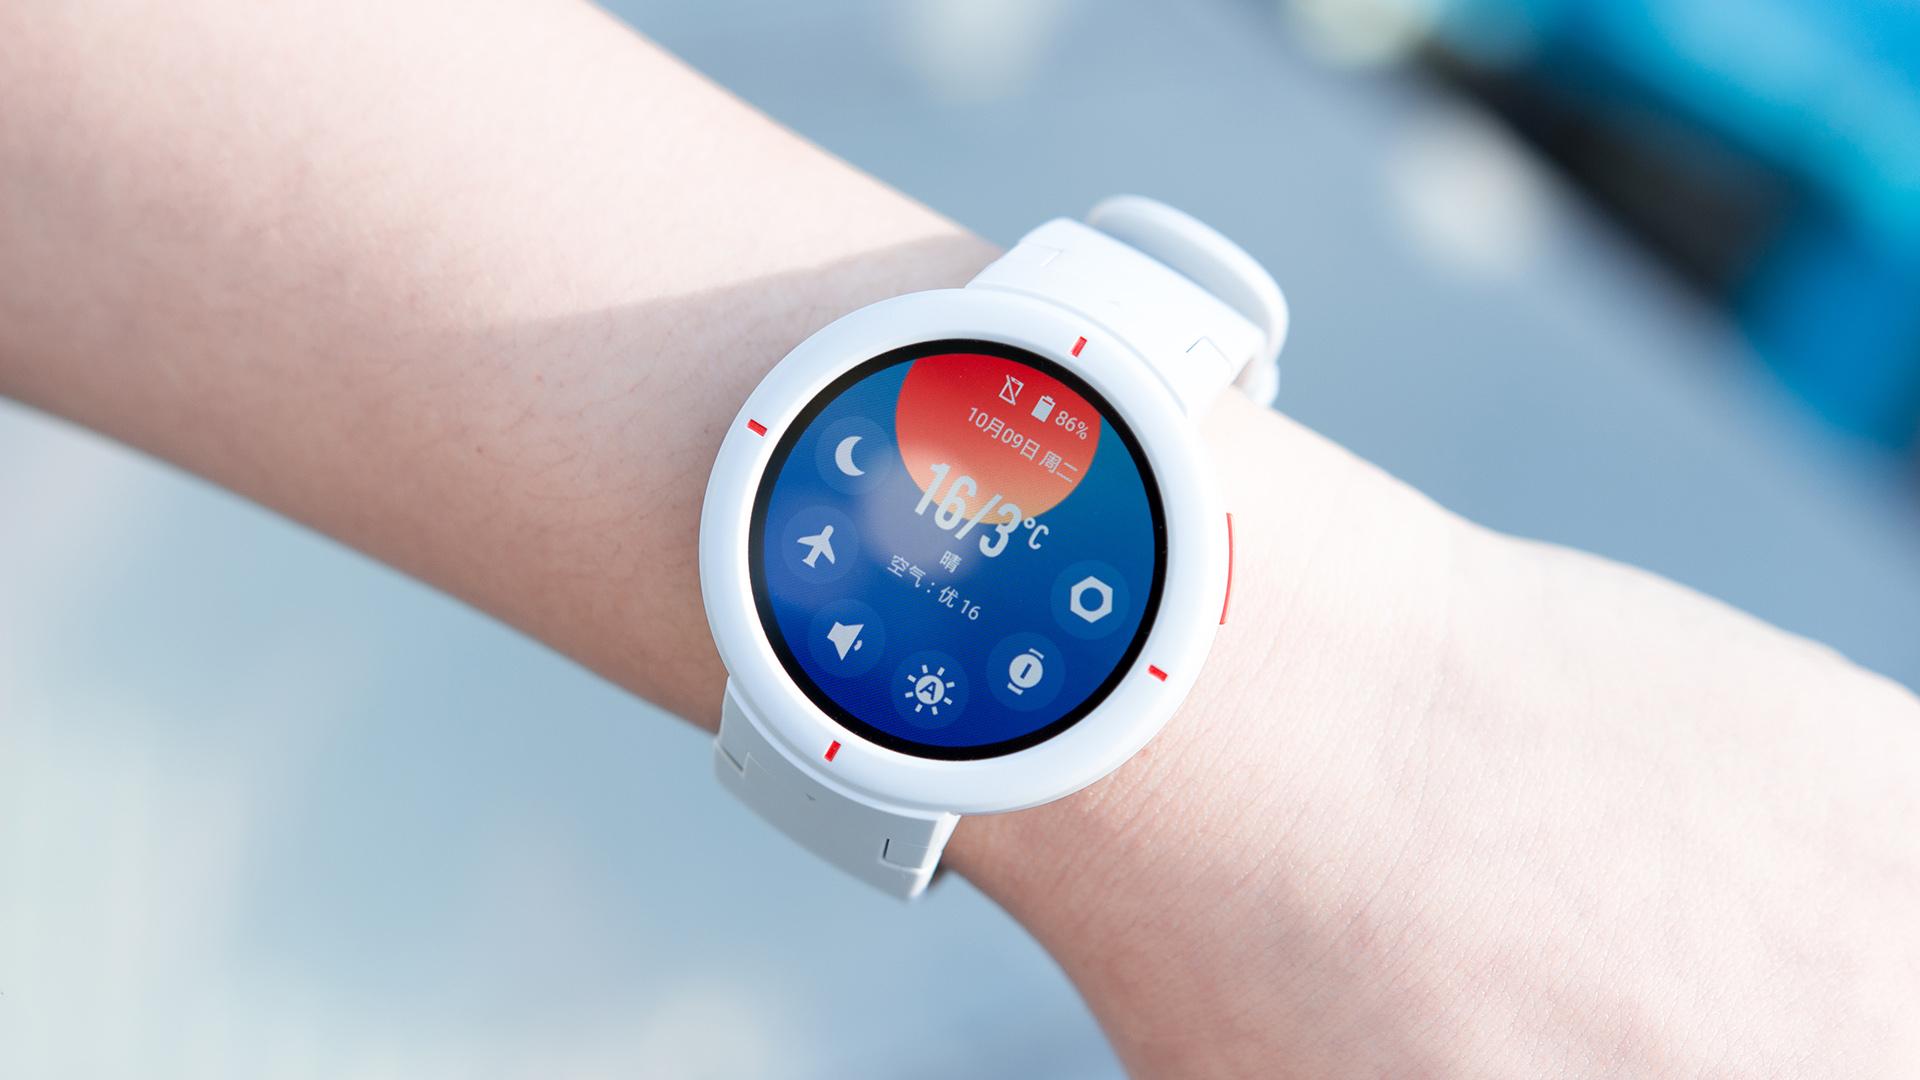 AMAZFIT智能手表图赏:活力配色 简约时尚